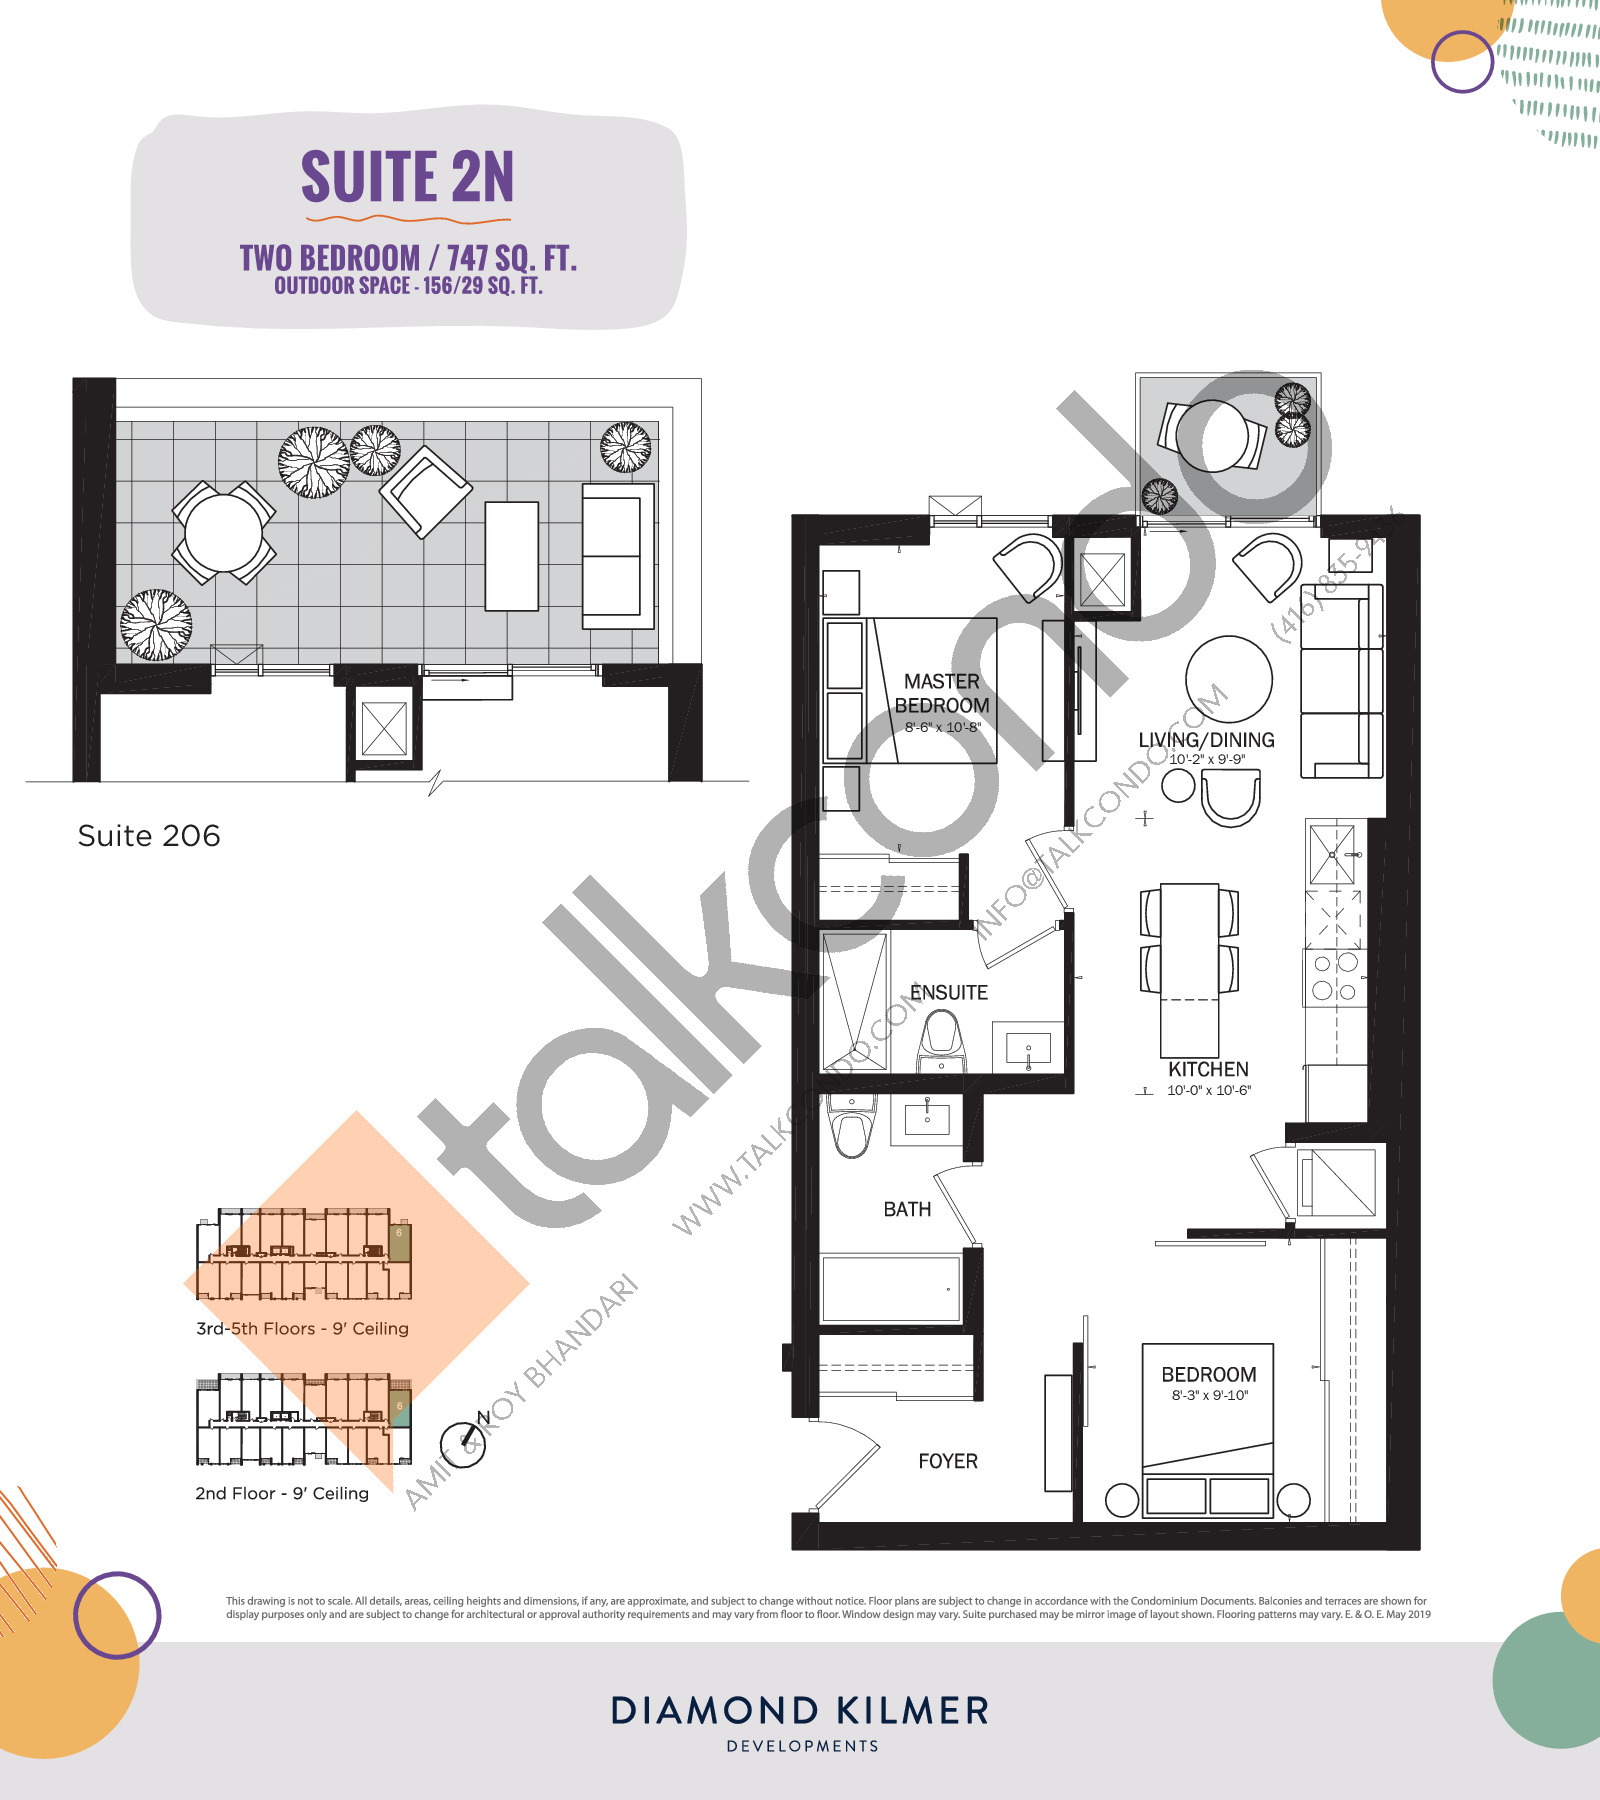 2N Floor Plan at Reunion Crossing Condos & Urban Towns - 747 sq.ft